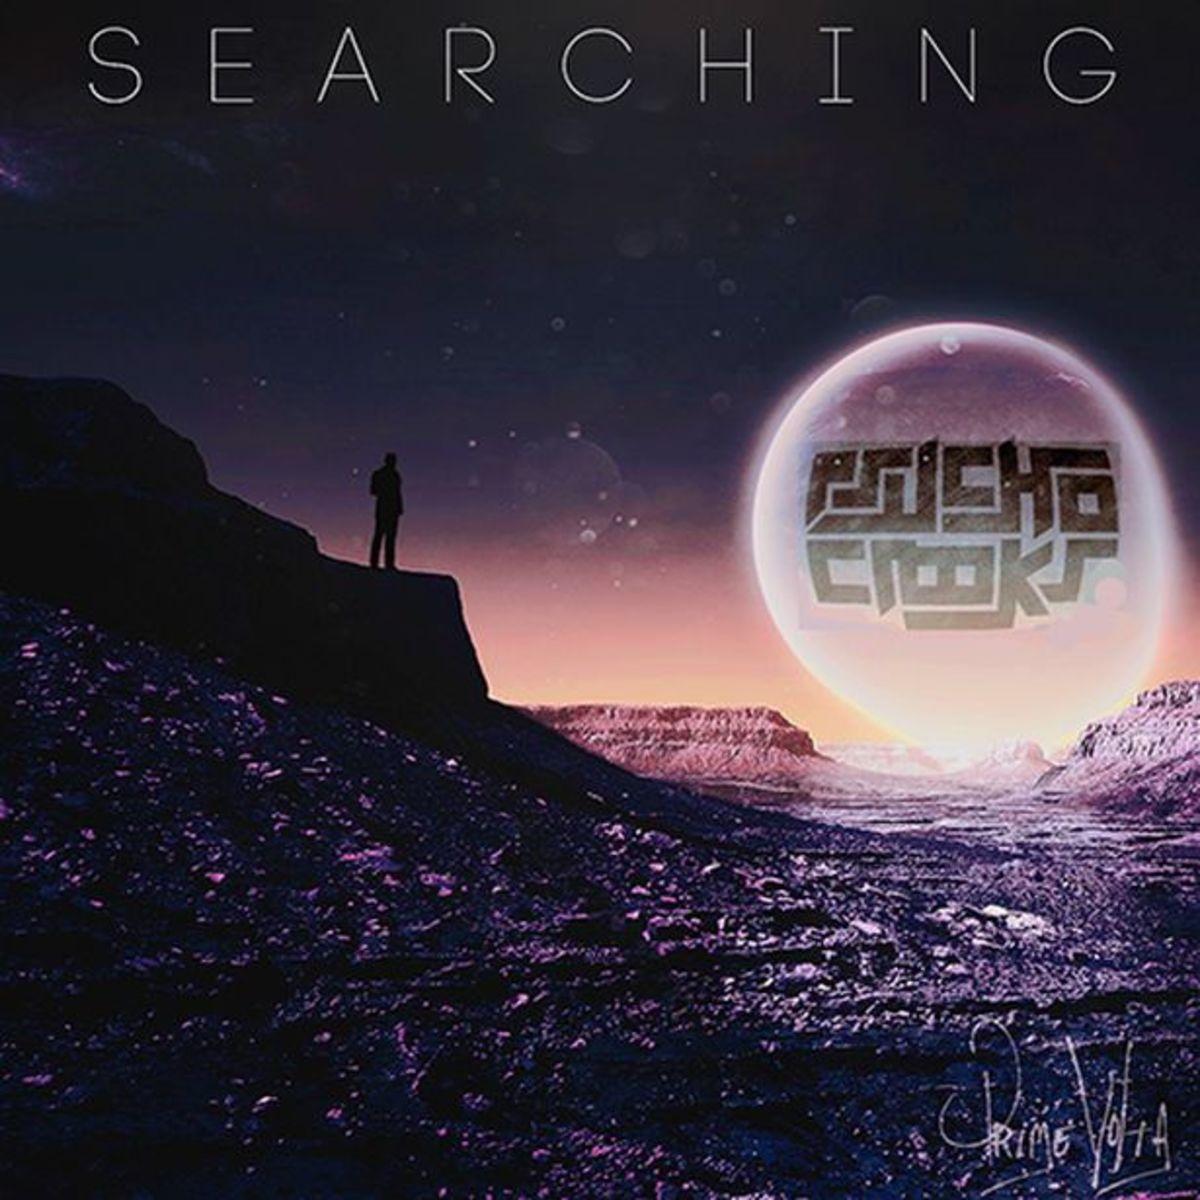 EDM Download: Pyscho Crooks - Searching (Prime Volta Release) - File Under Post EDC ELM